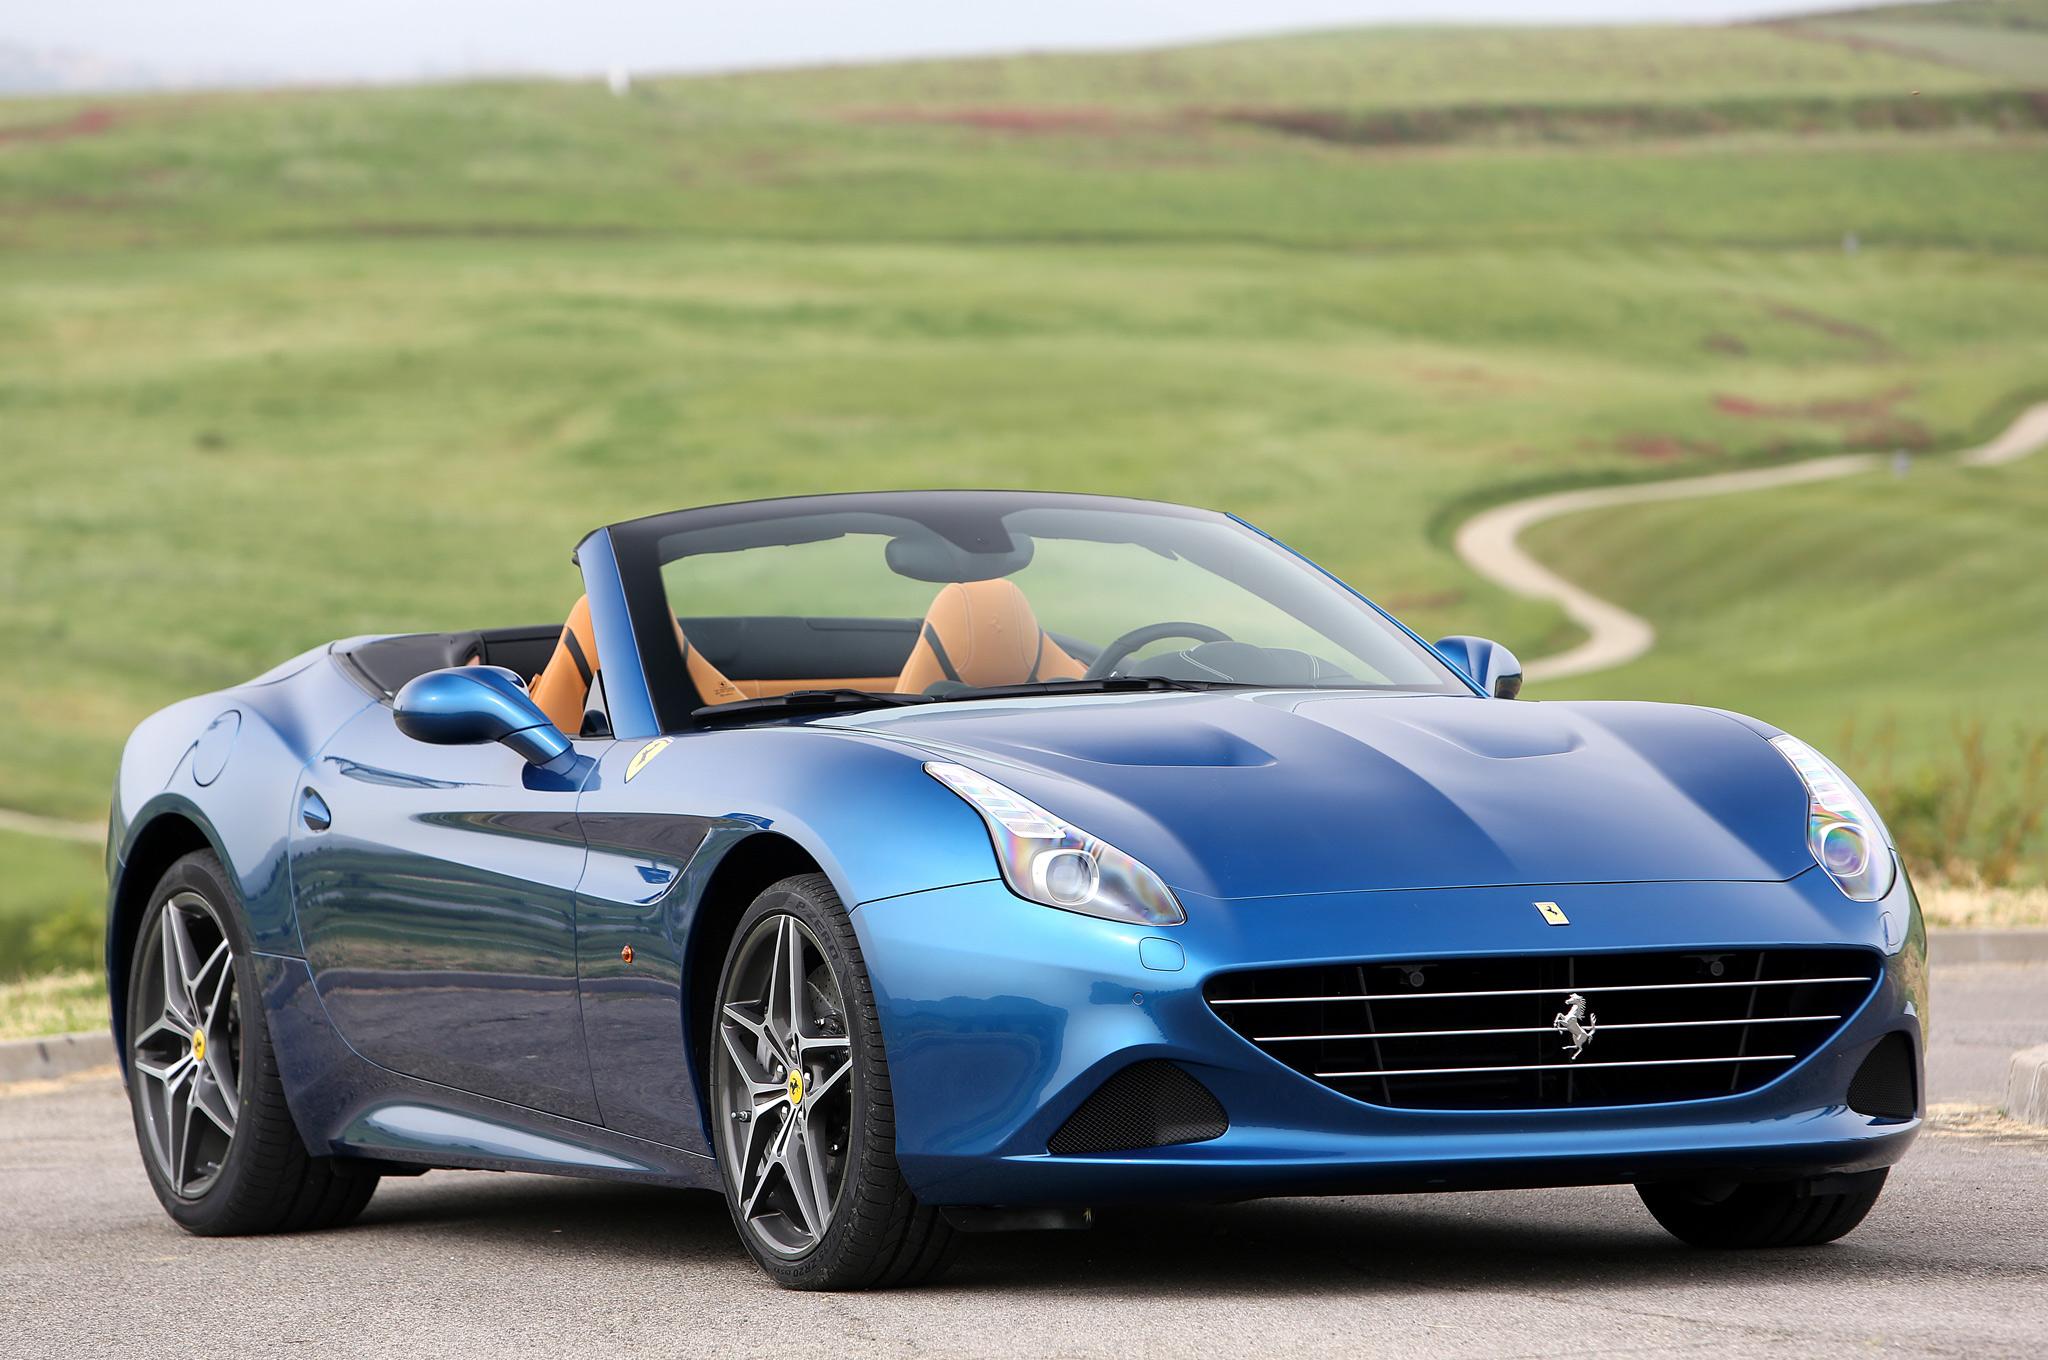 Ferrari California T 2015 Specifications Price And Release